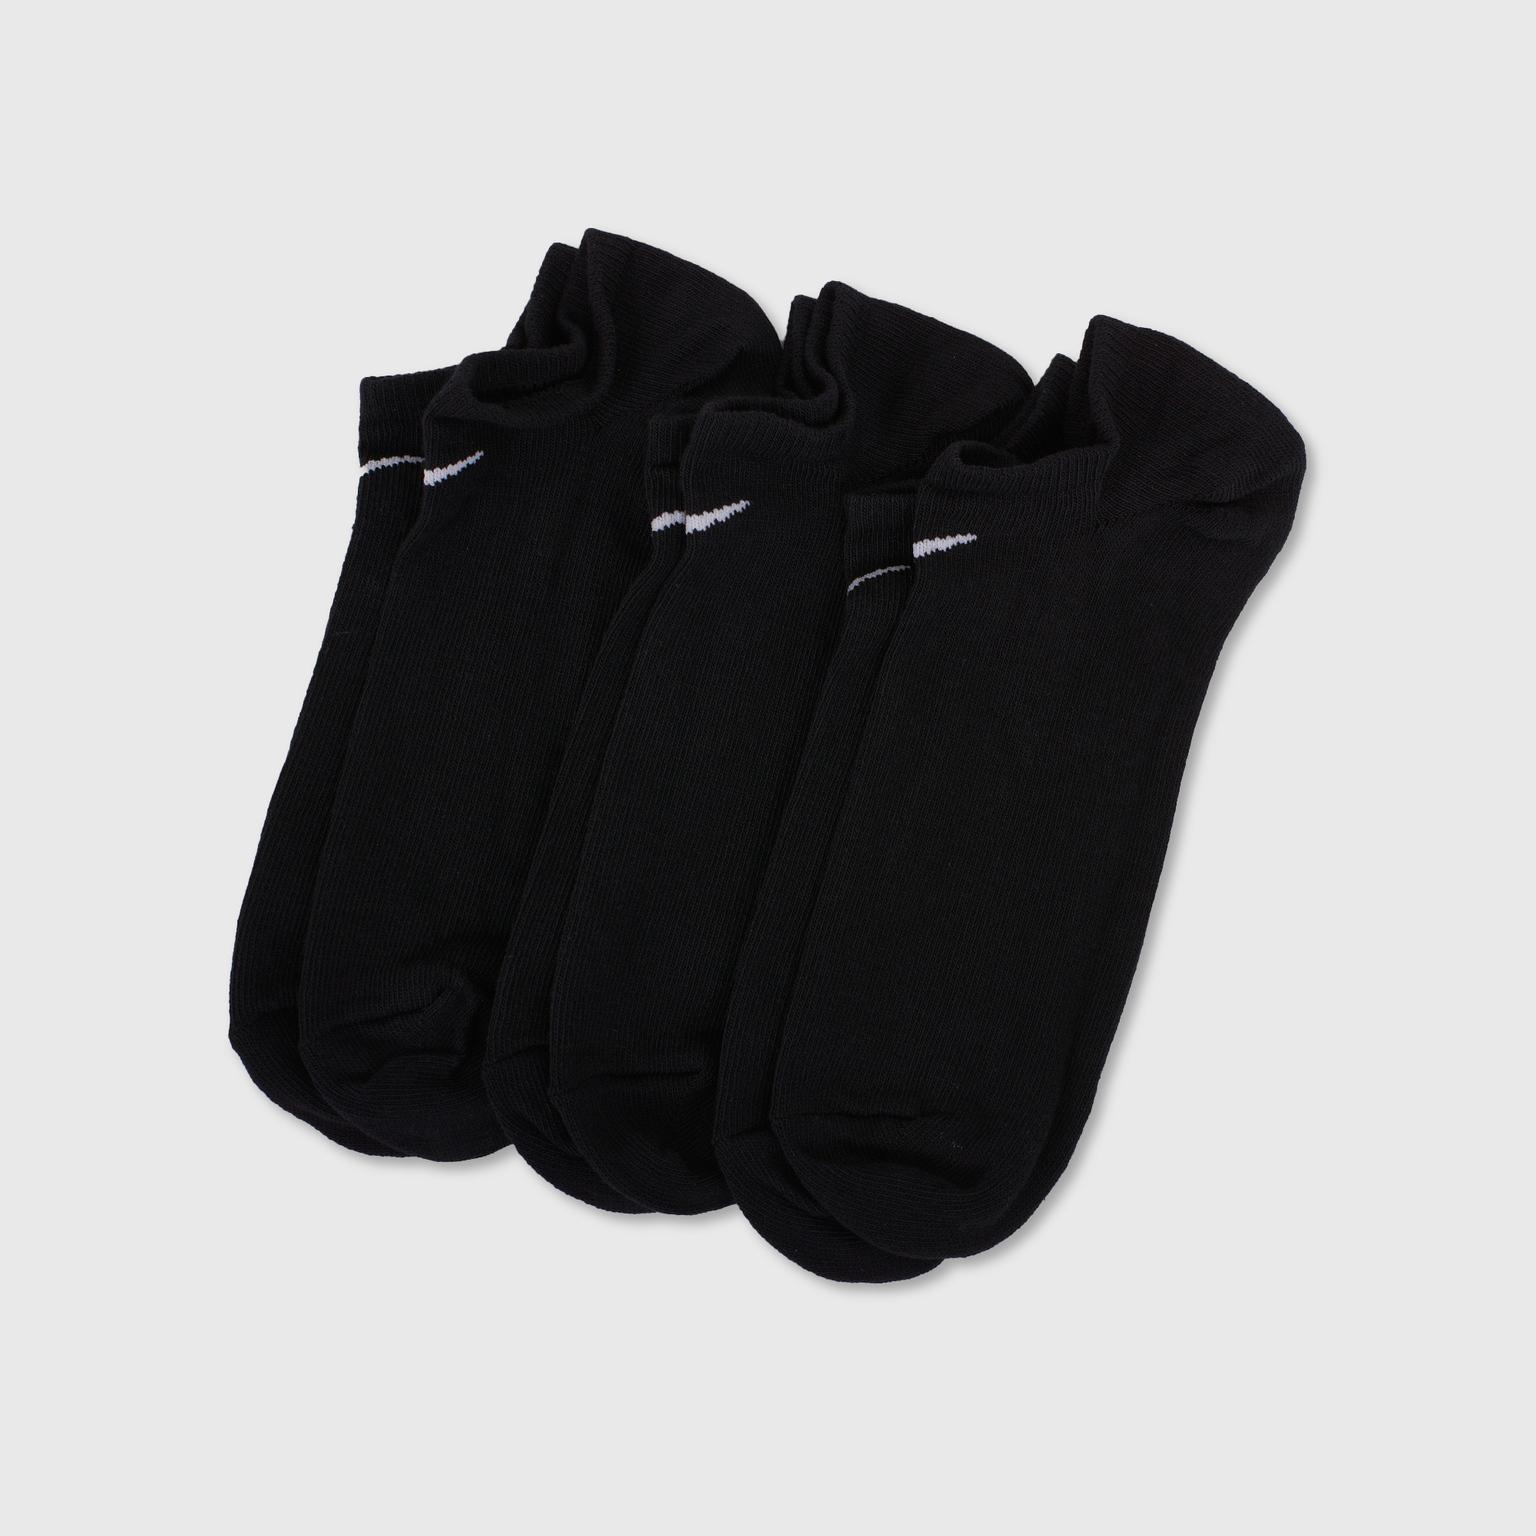 Носки Nike Носки Nike 3ppk value no show